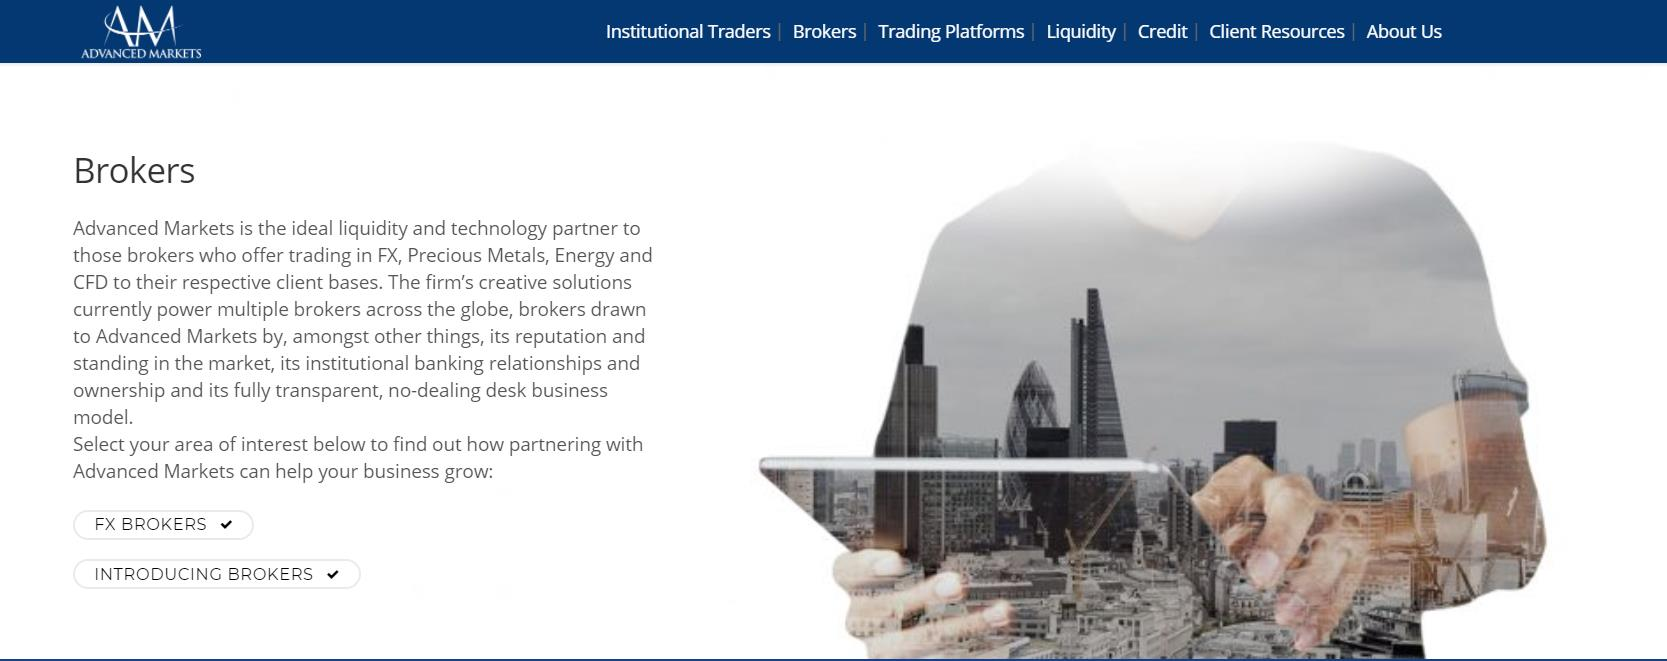 брокерская компания advanced markets